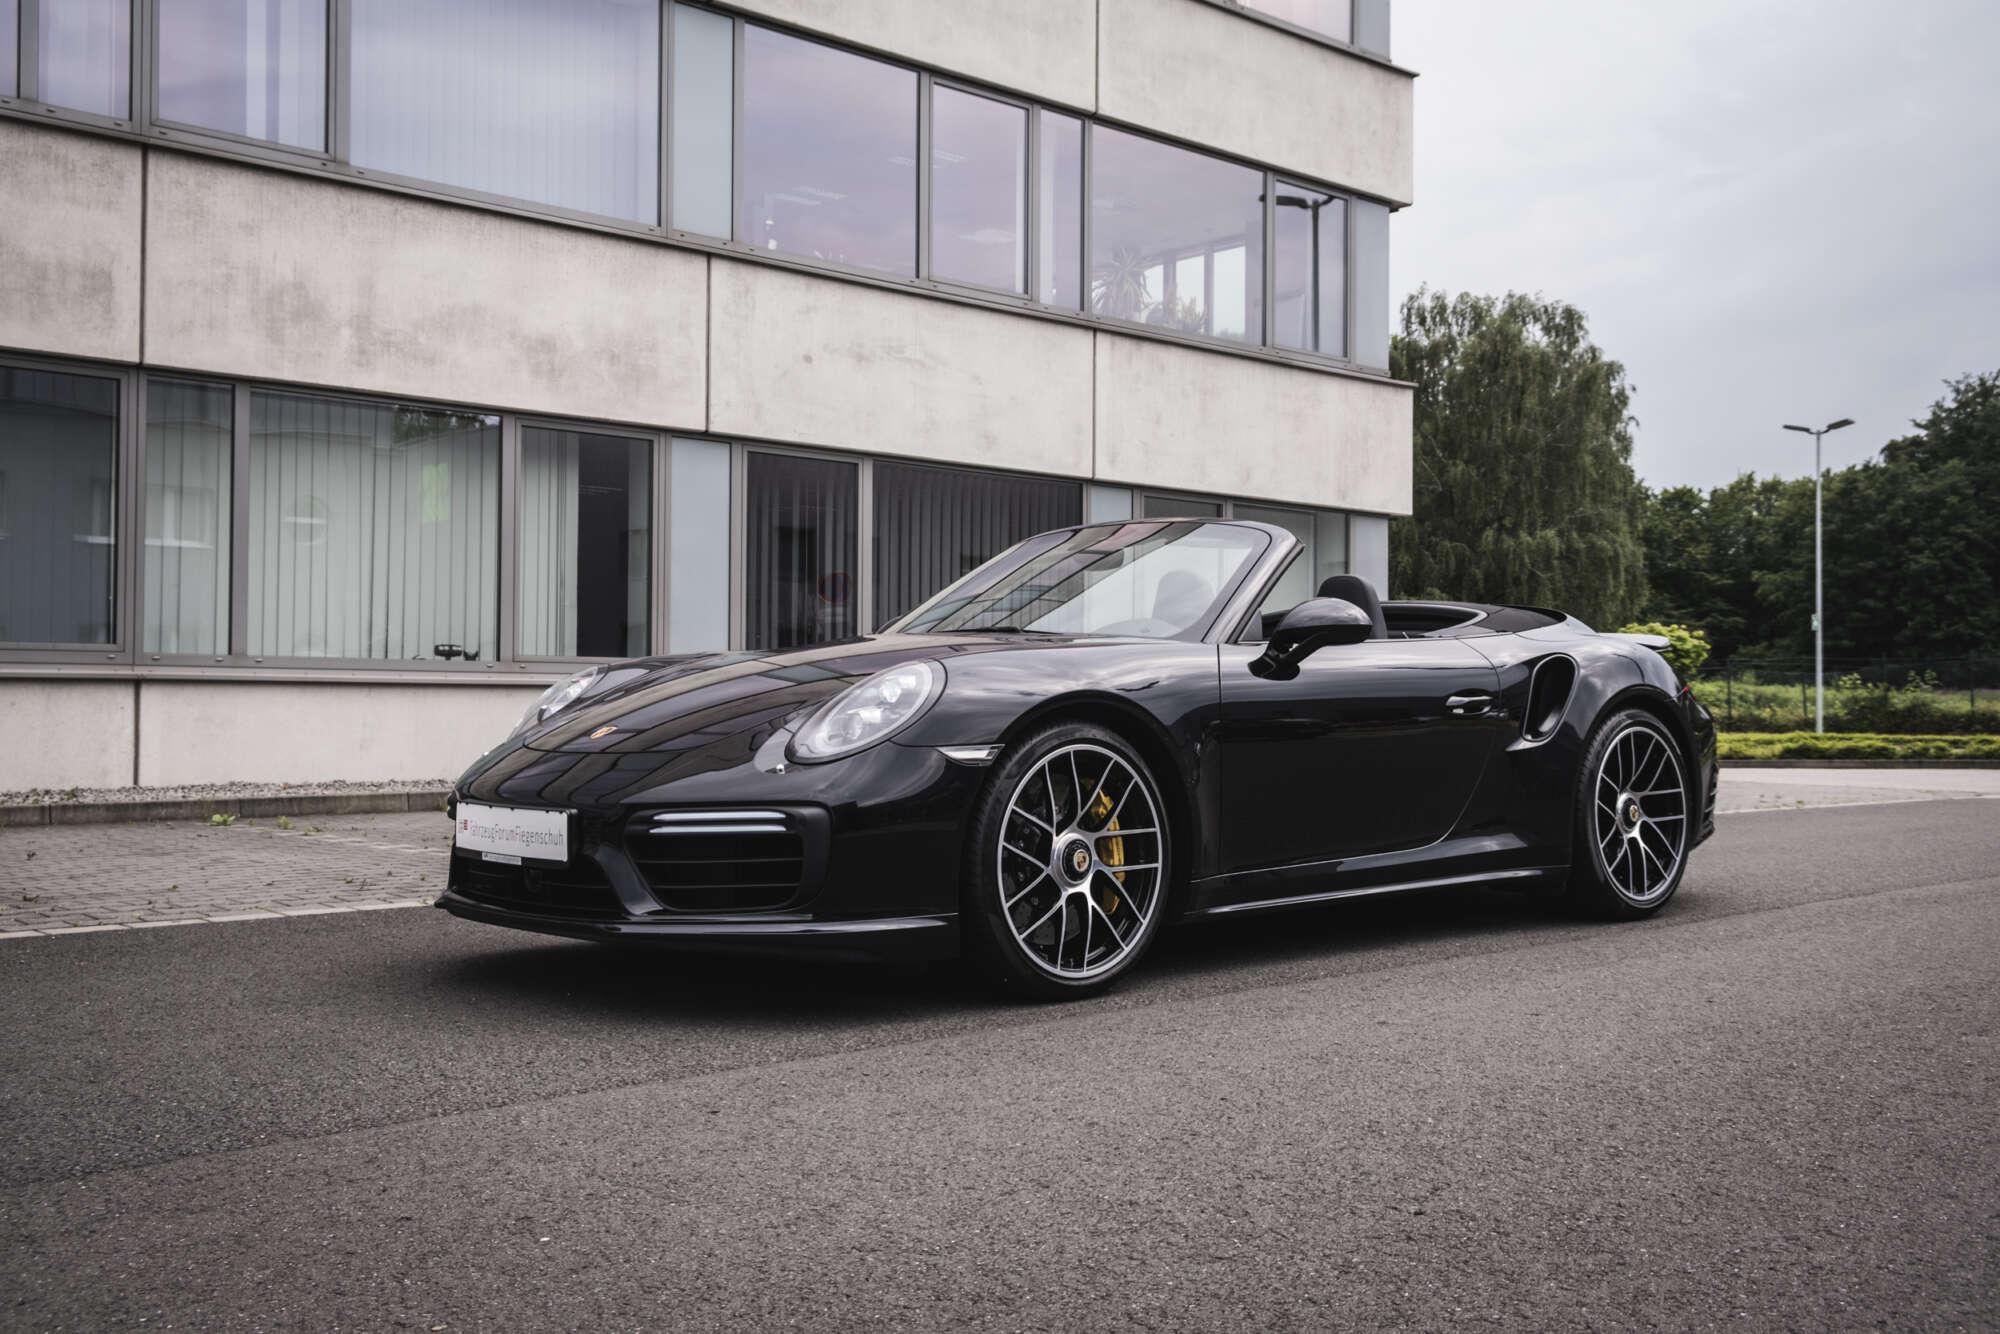 Porsche 991.2 Turbo S